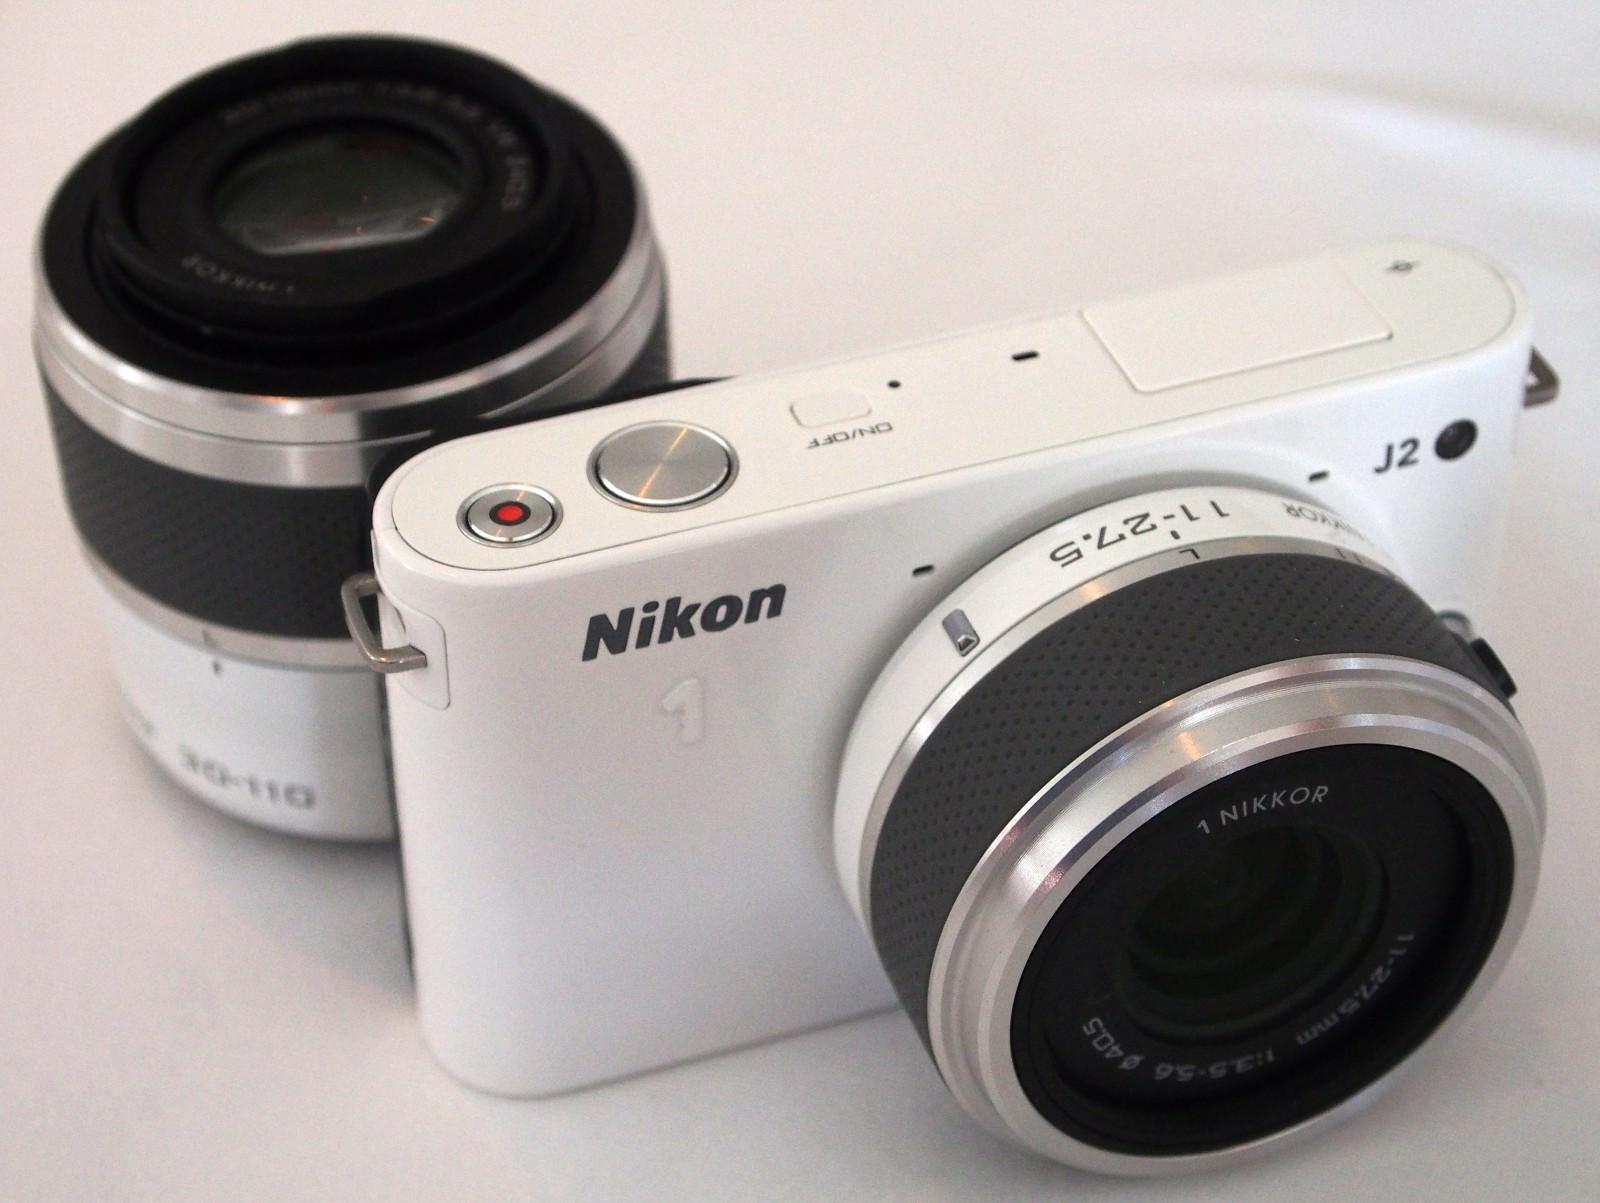 Nikon J2 Hands